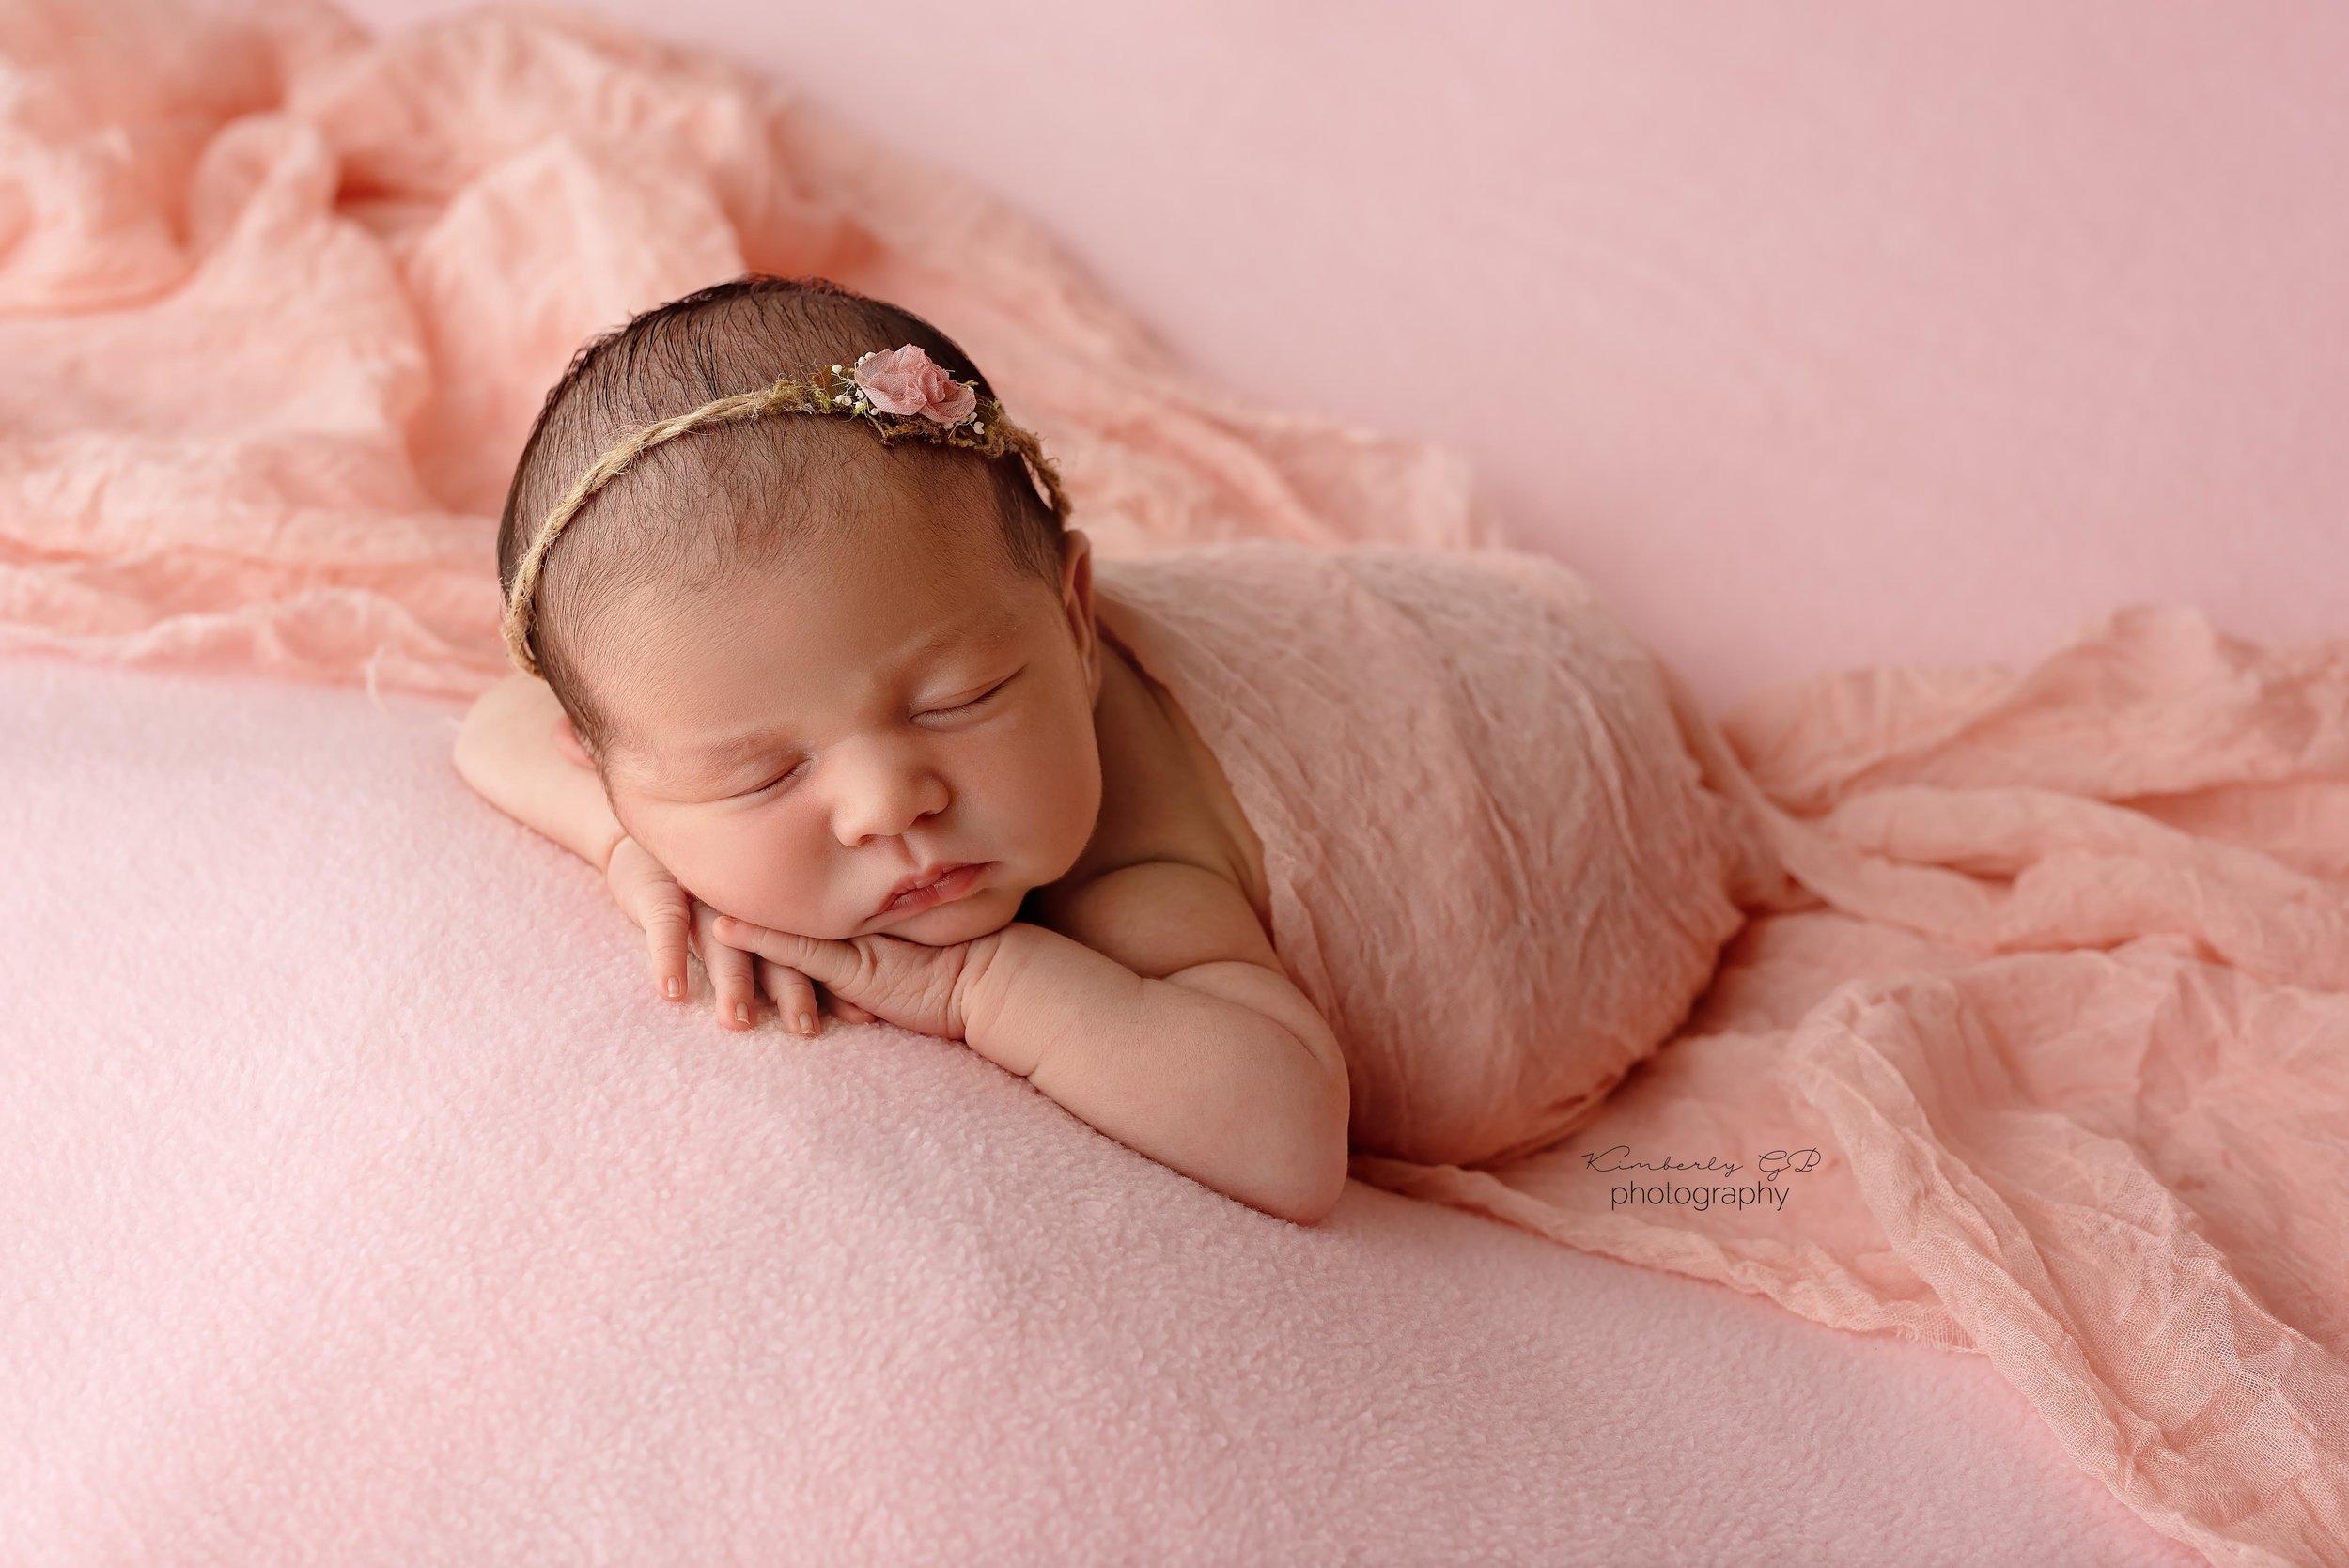 fotografia-de-recien-nacidos-bebes-newborn-en-puerto-rico-kimberly-gb-photography-fotografa-269.jpg